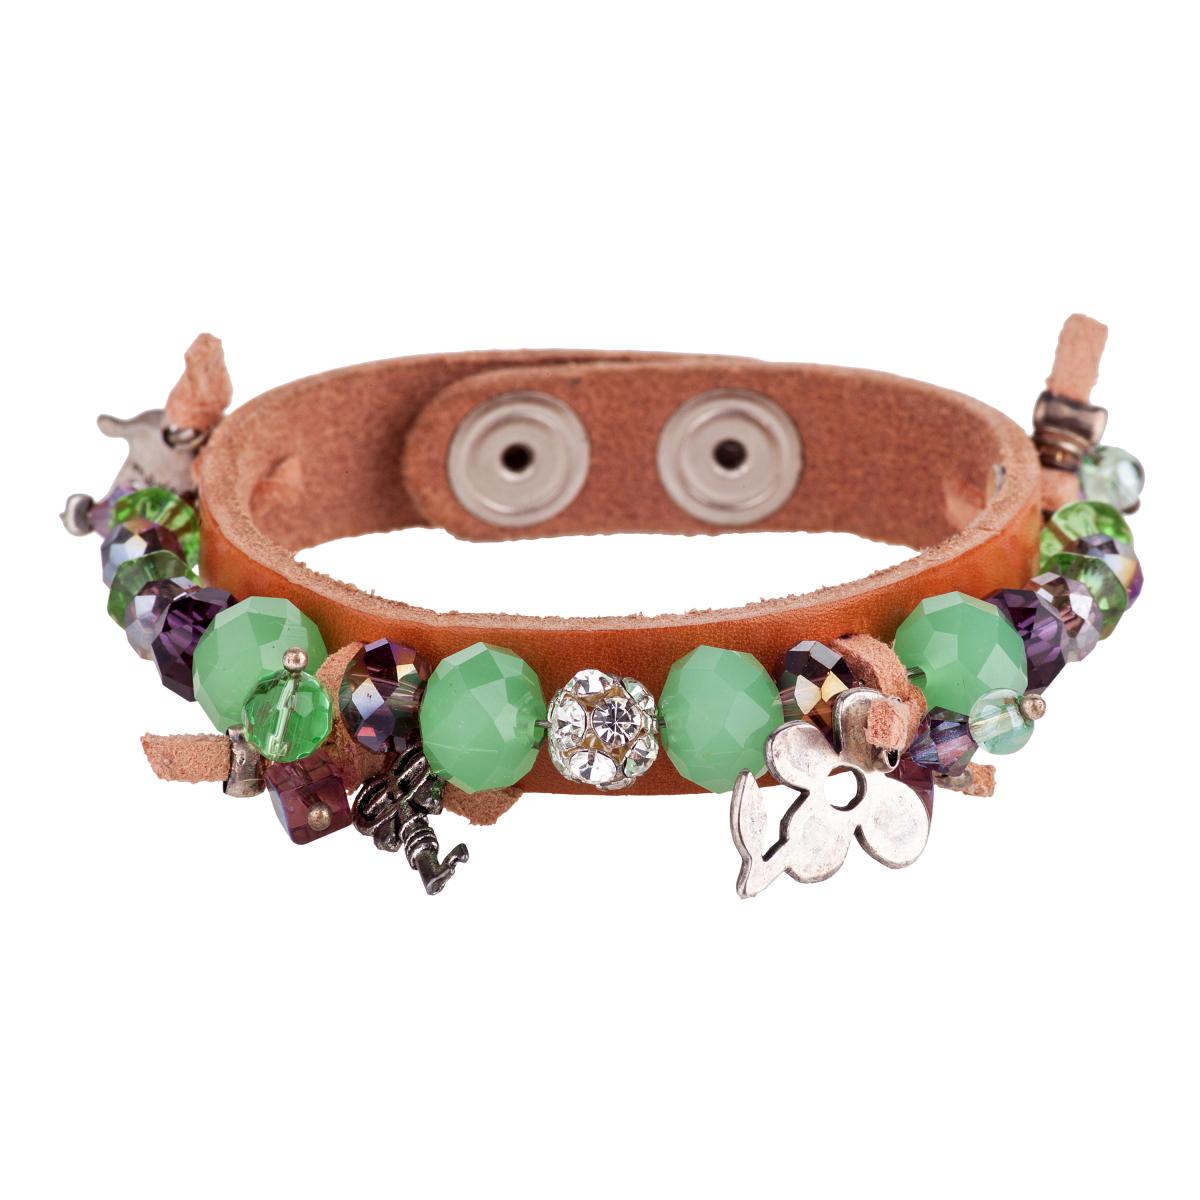 Minty shades leather bracelet